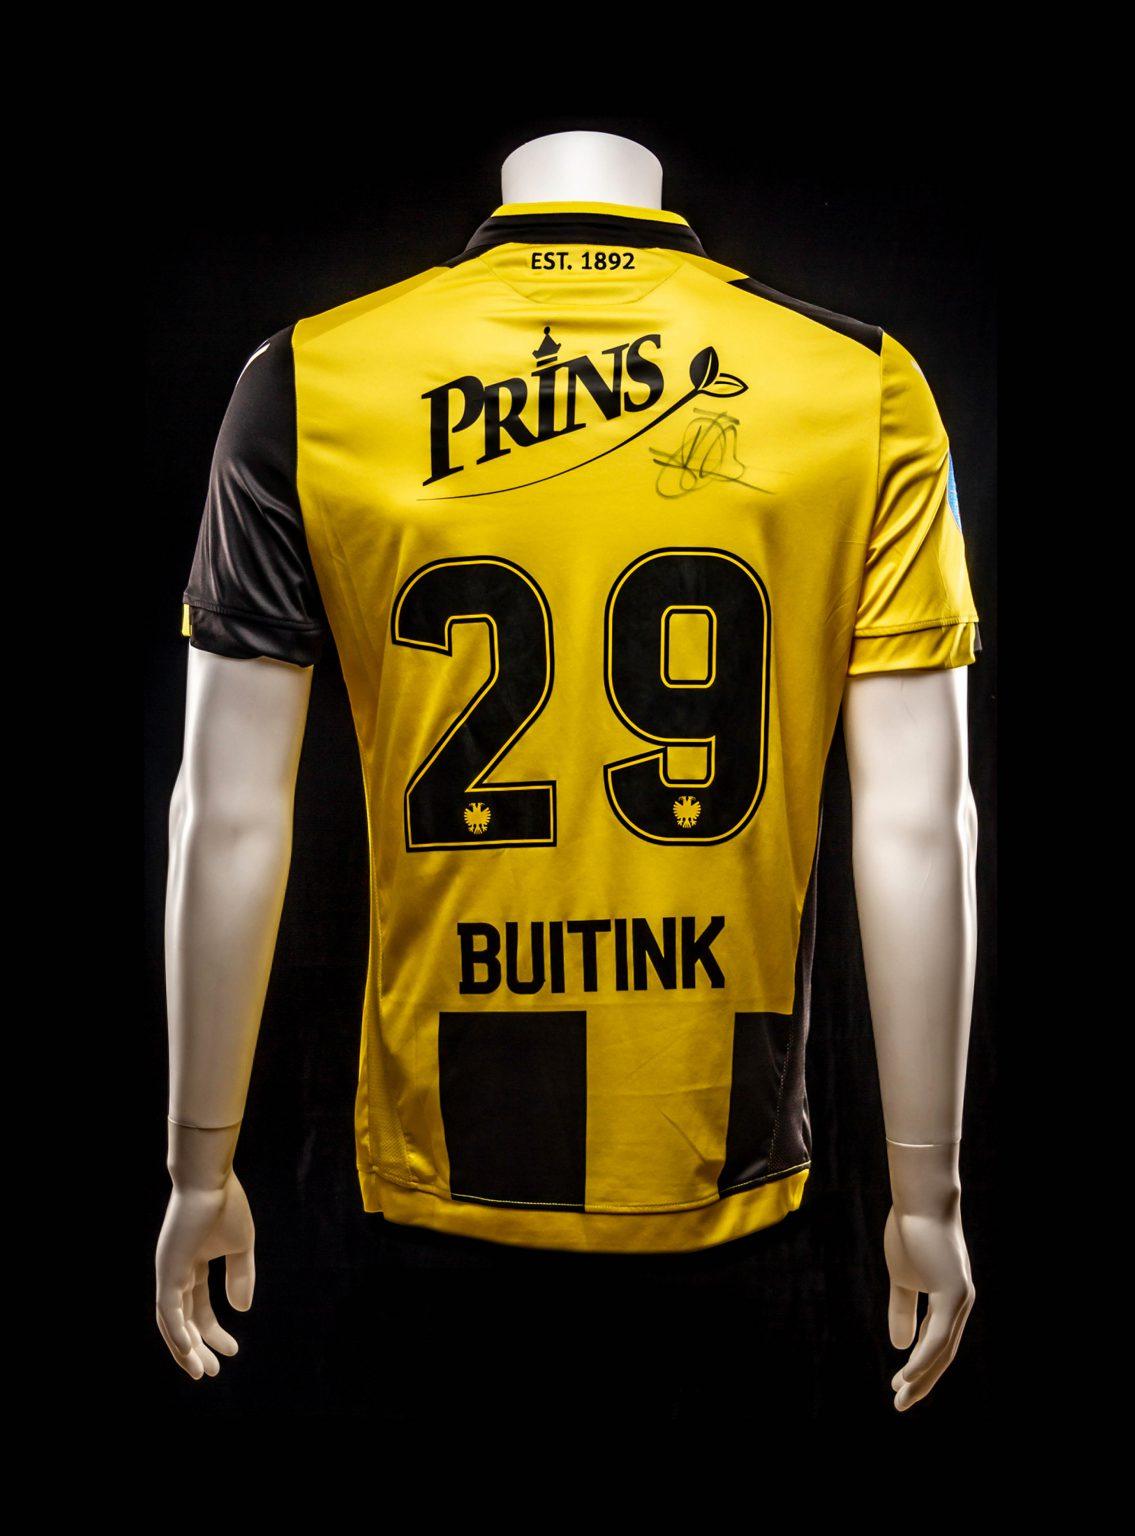 #29 Thomas Buitink KWF 2018-2019